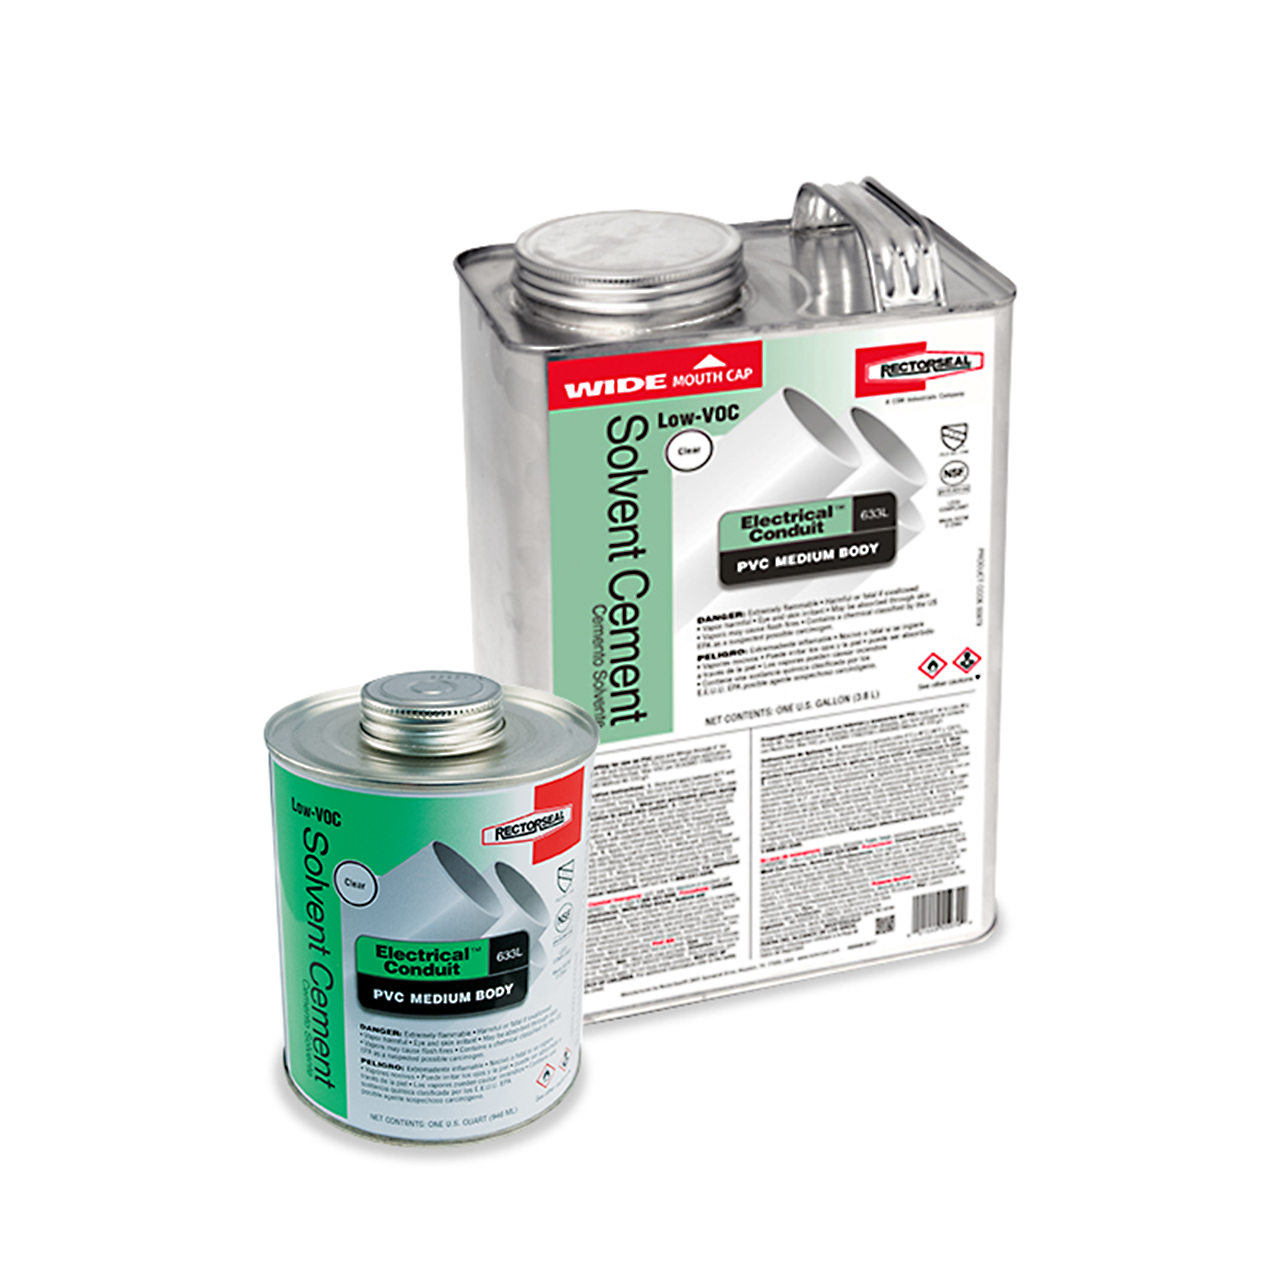 RectorSeal 55985 Quart of Solvent Cement